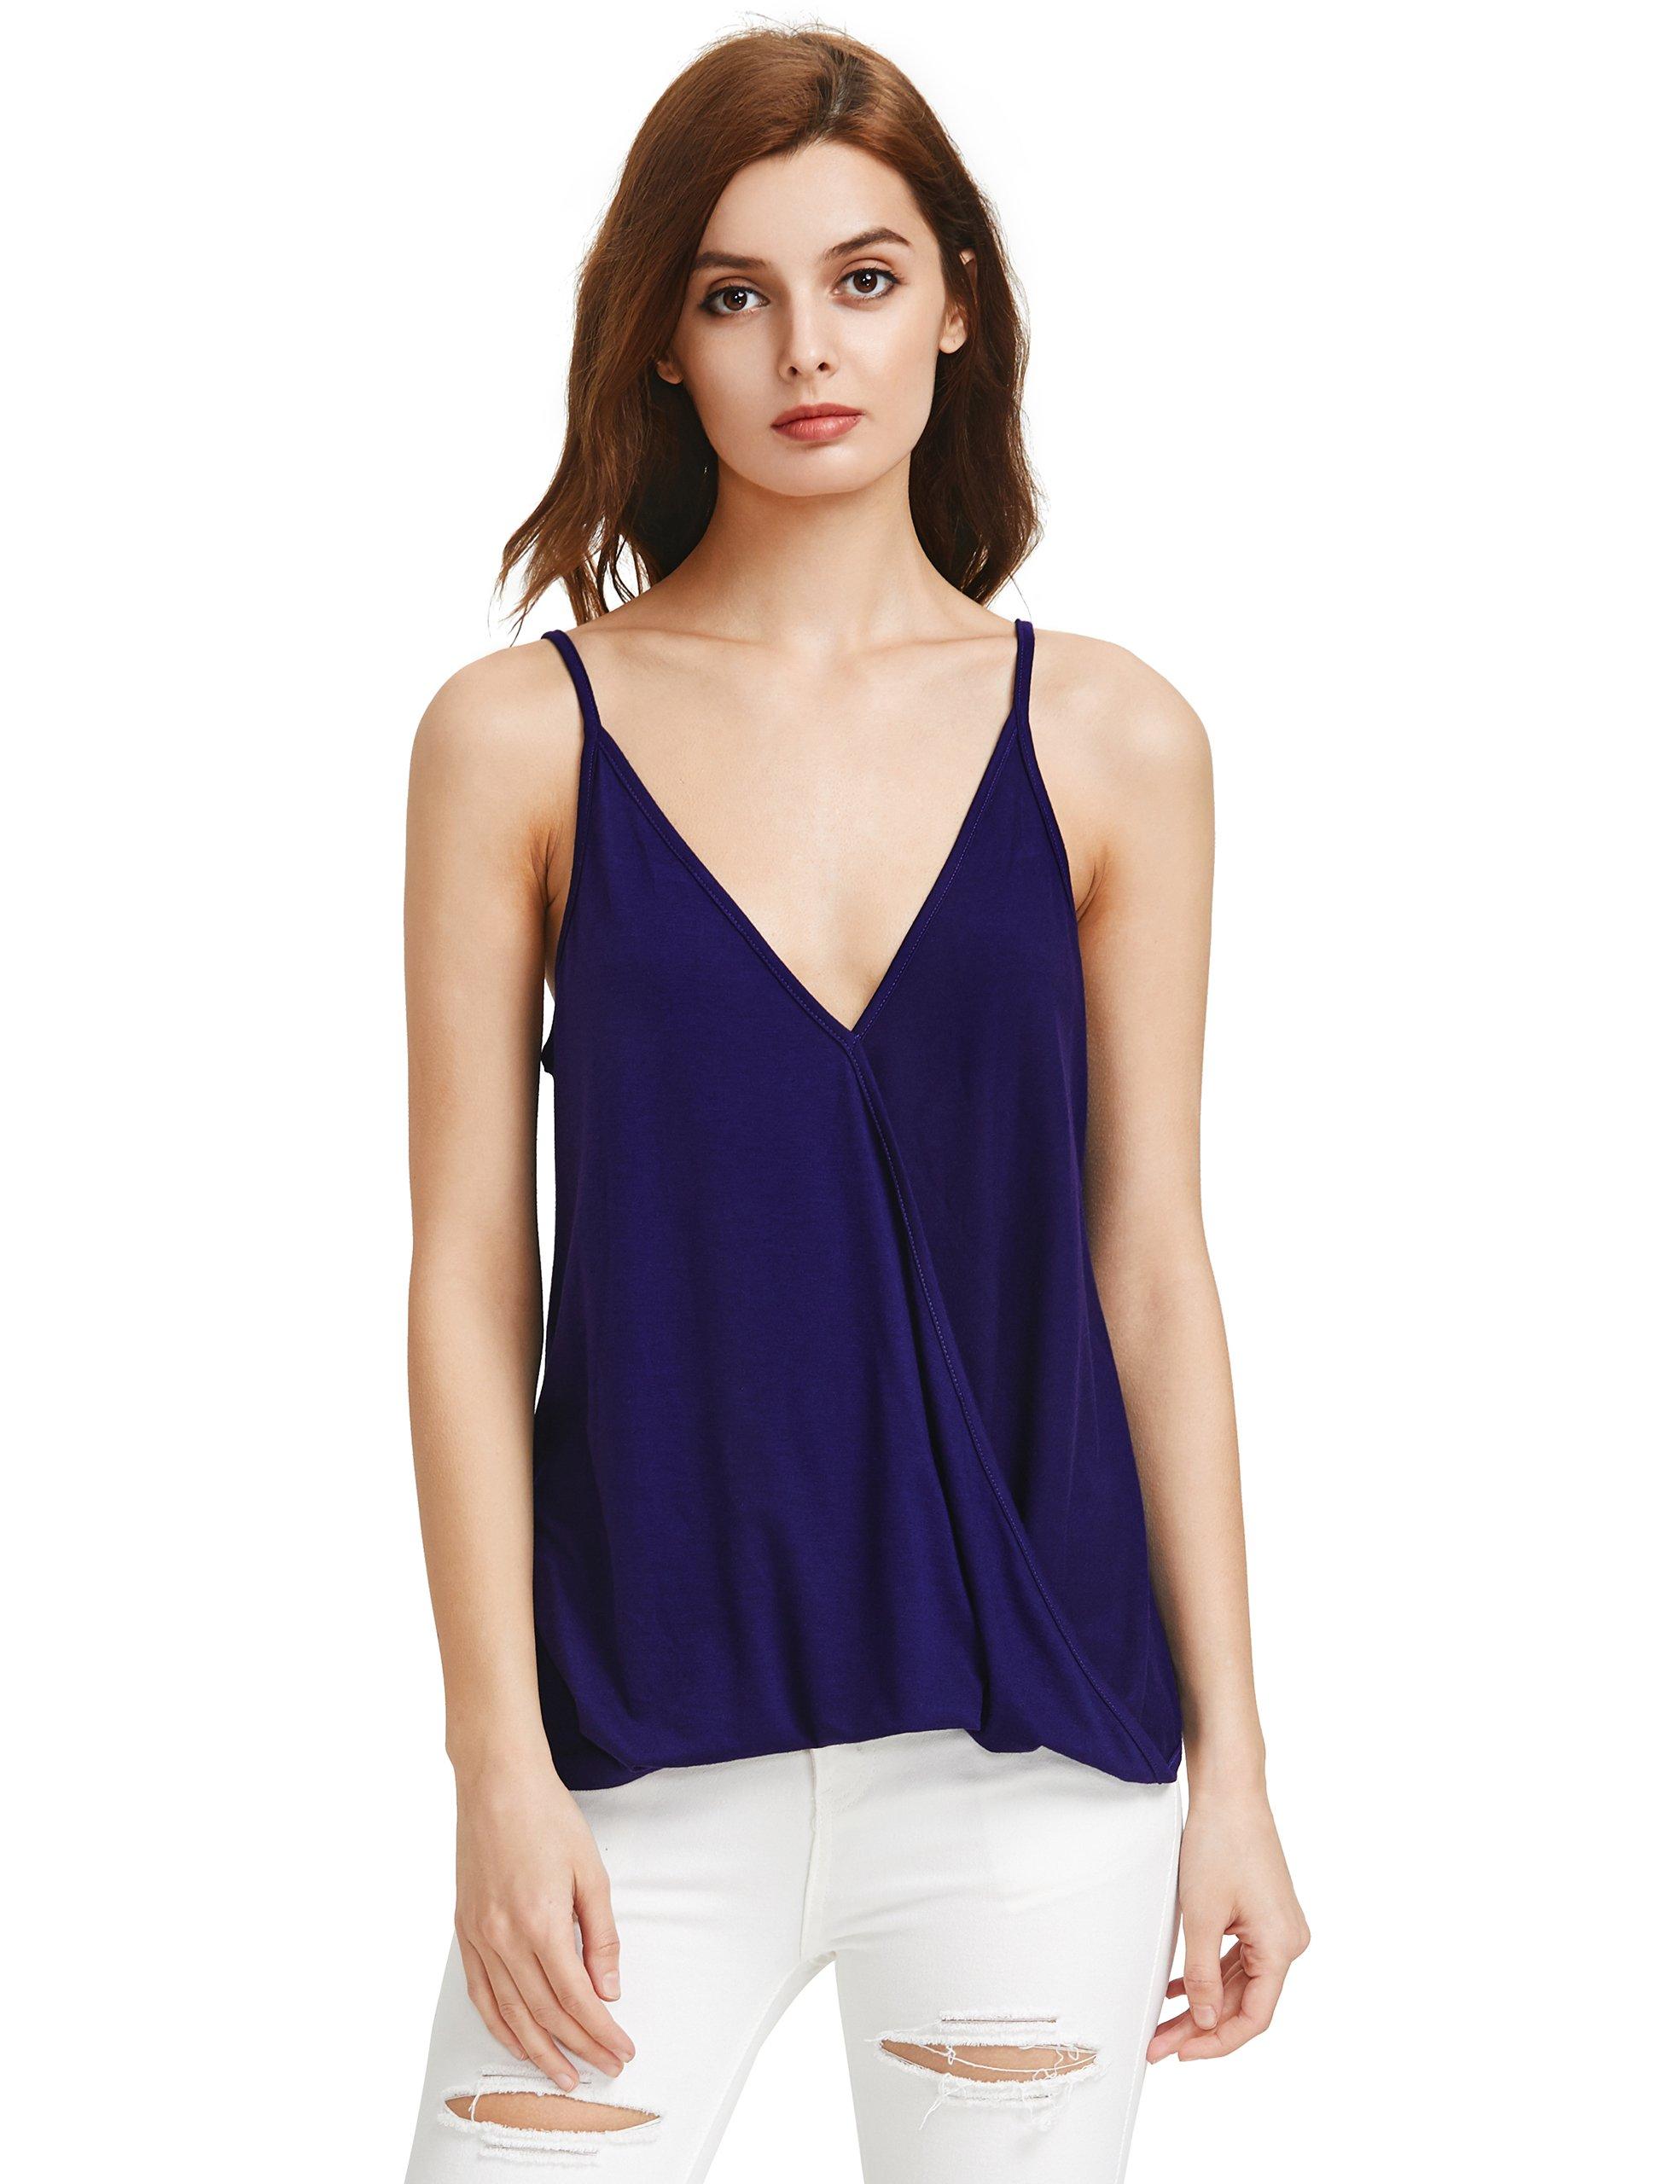 Romwe Women's V Neck Strappy Loose T-Shirt Tank Top Vest Blouses Blue M